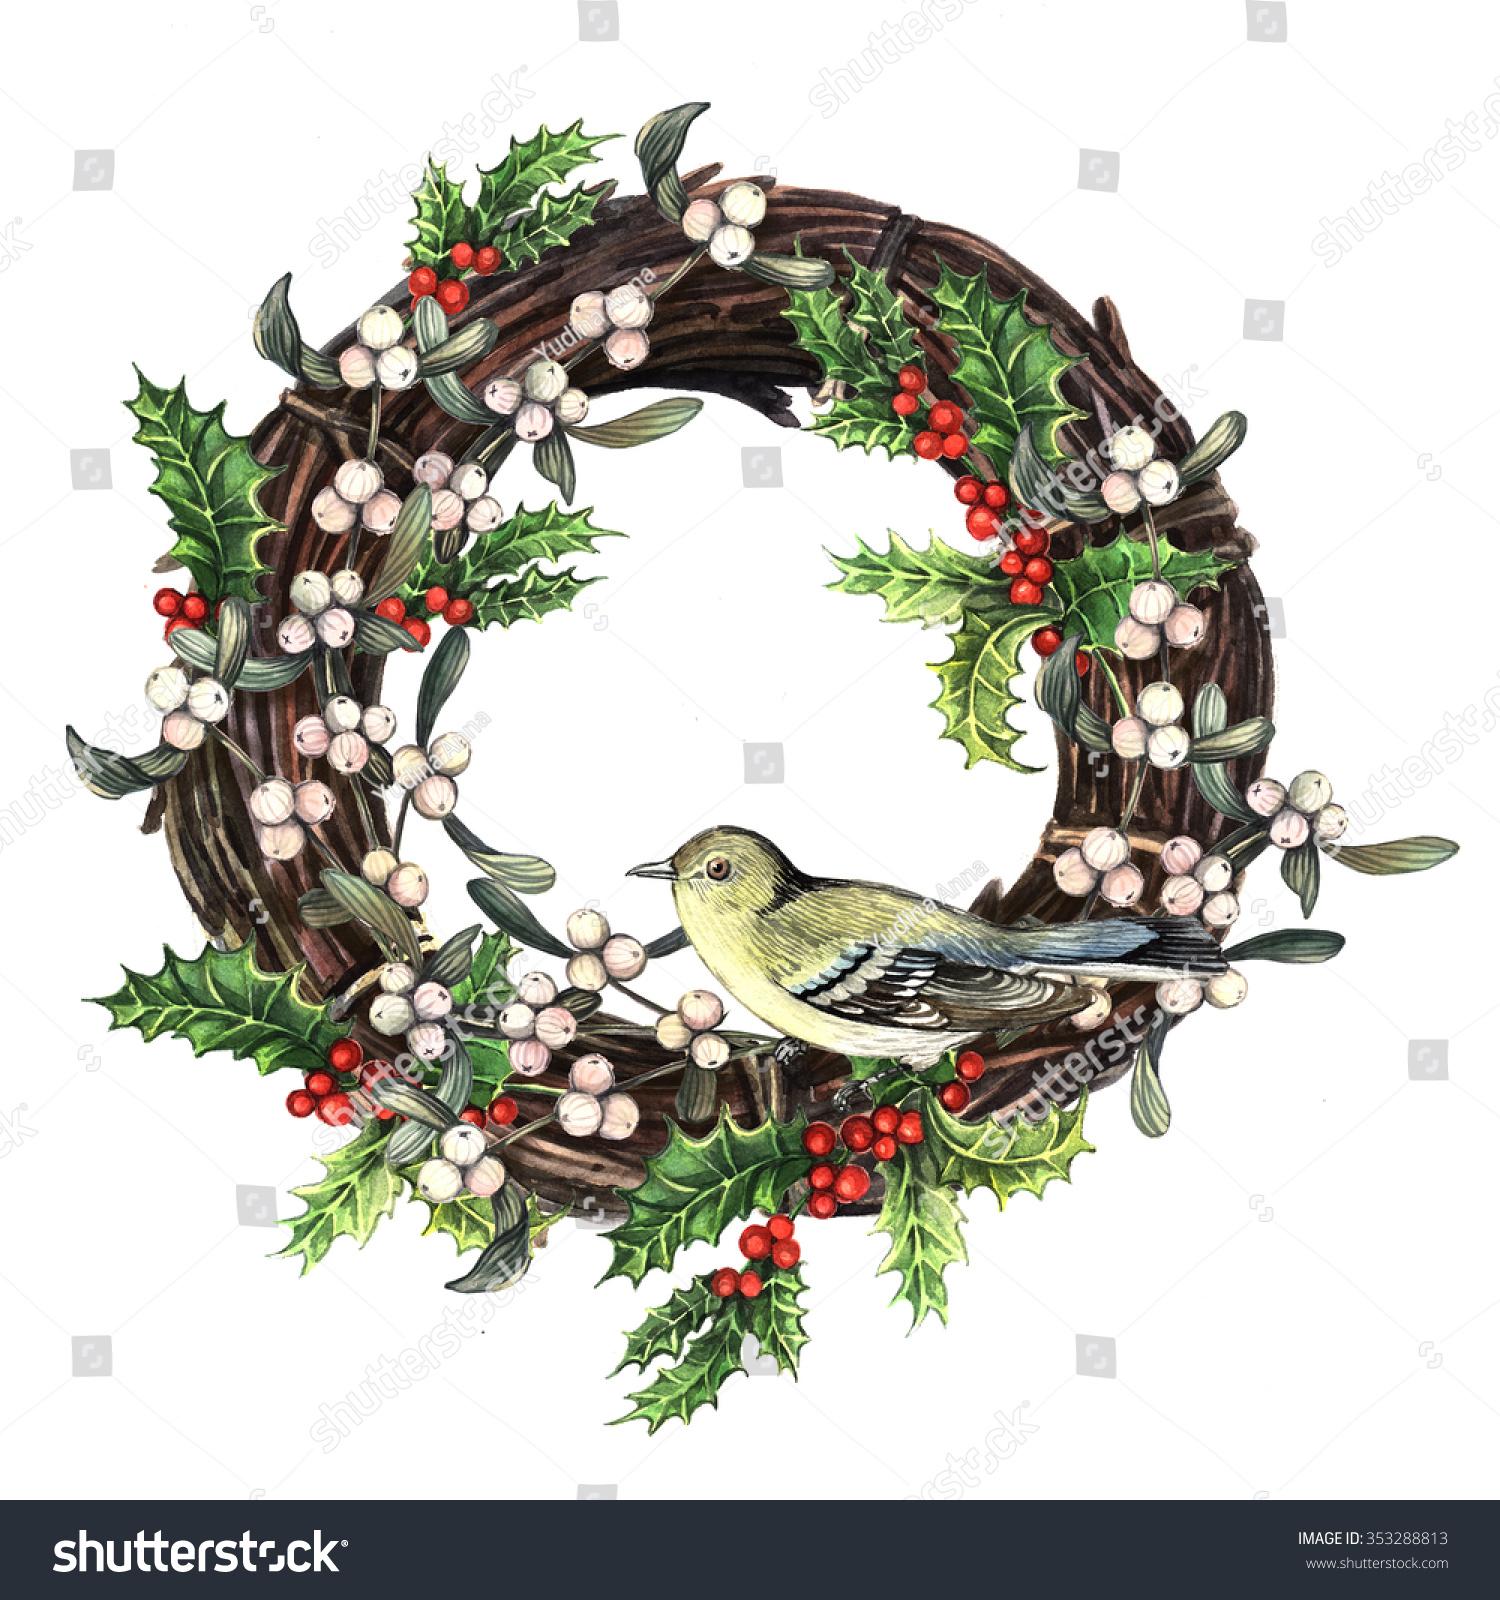 Watercolor Christmas Wreath Plants Birds Christmas Stock ...